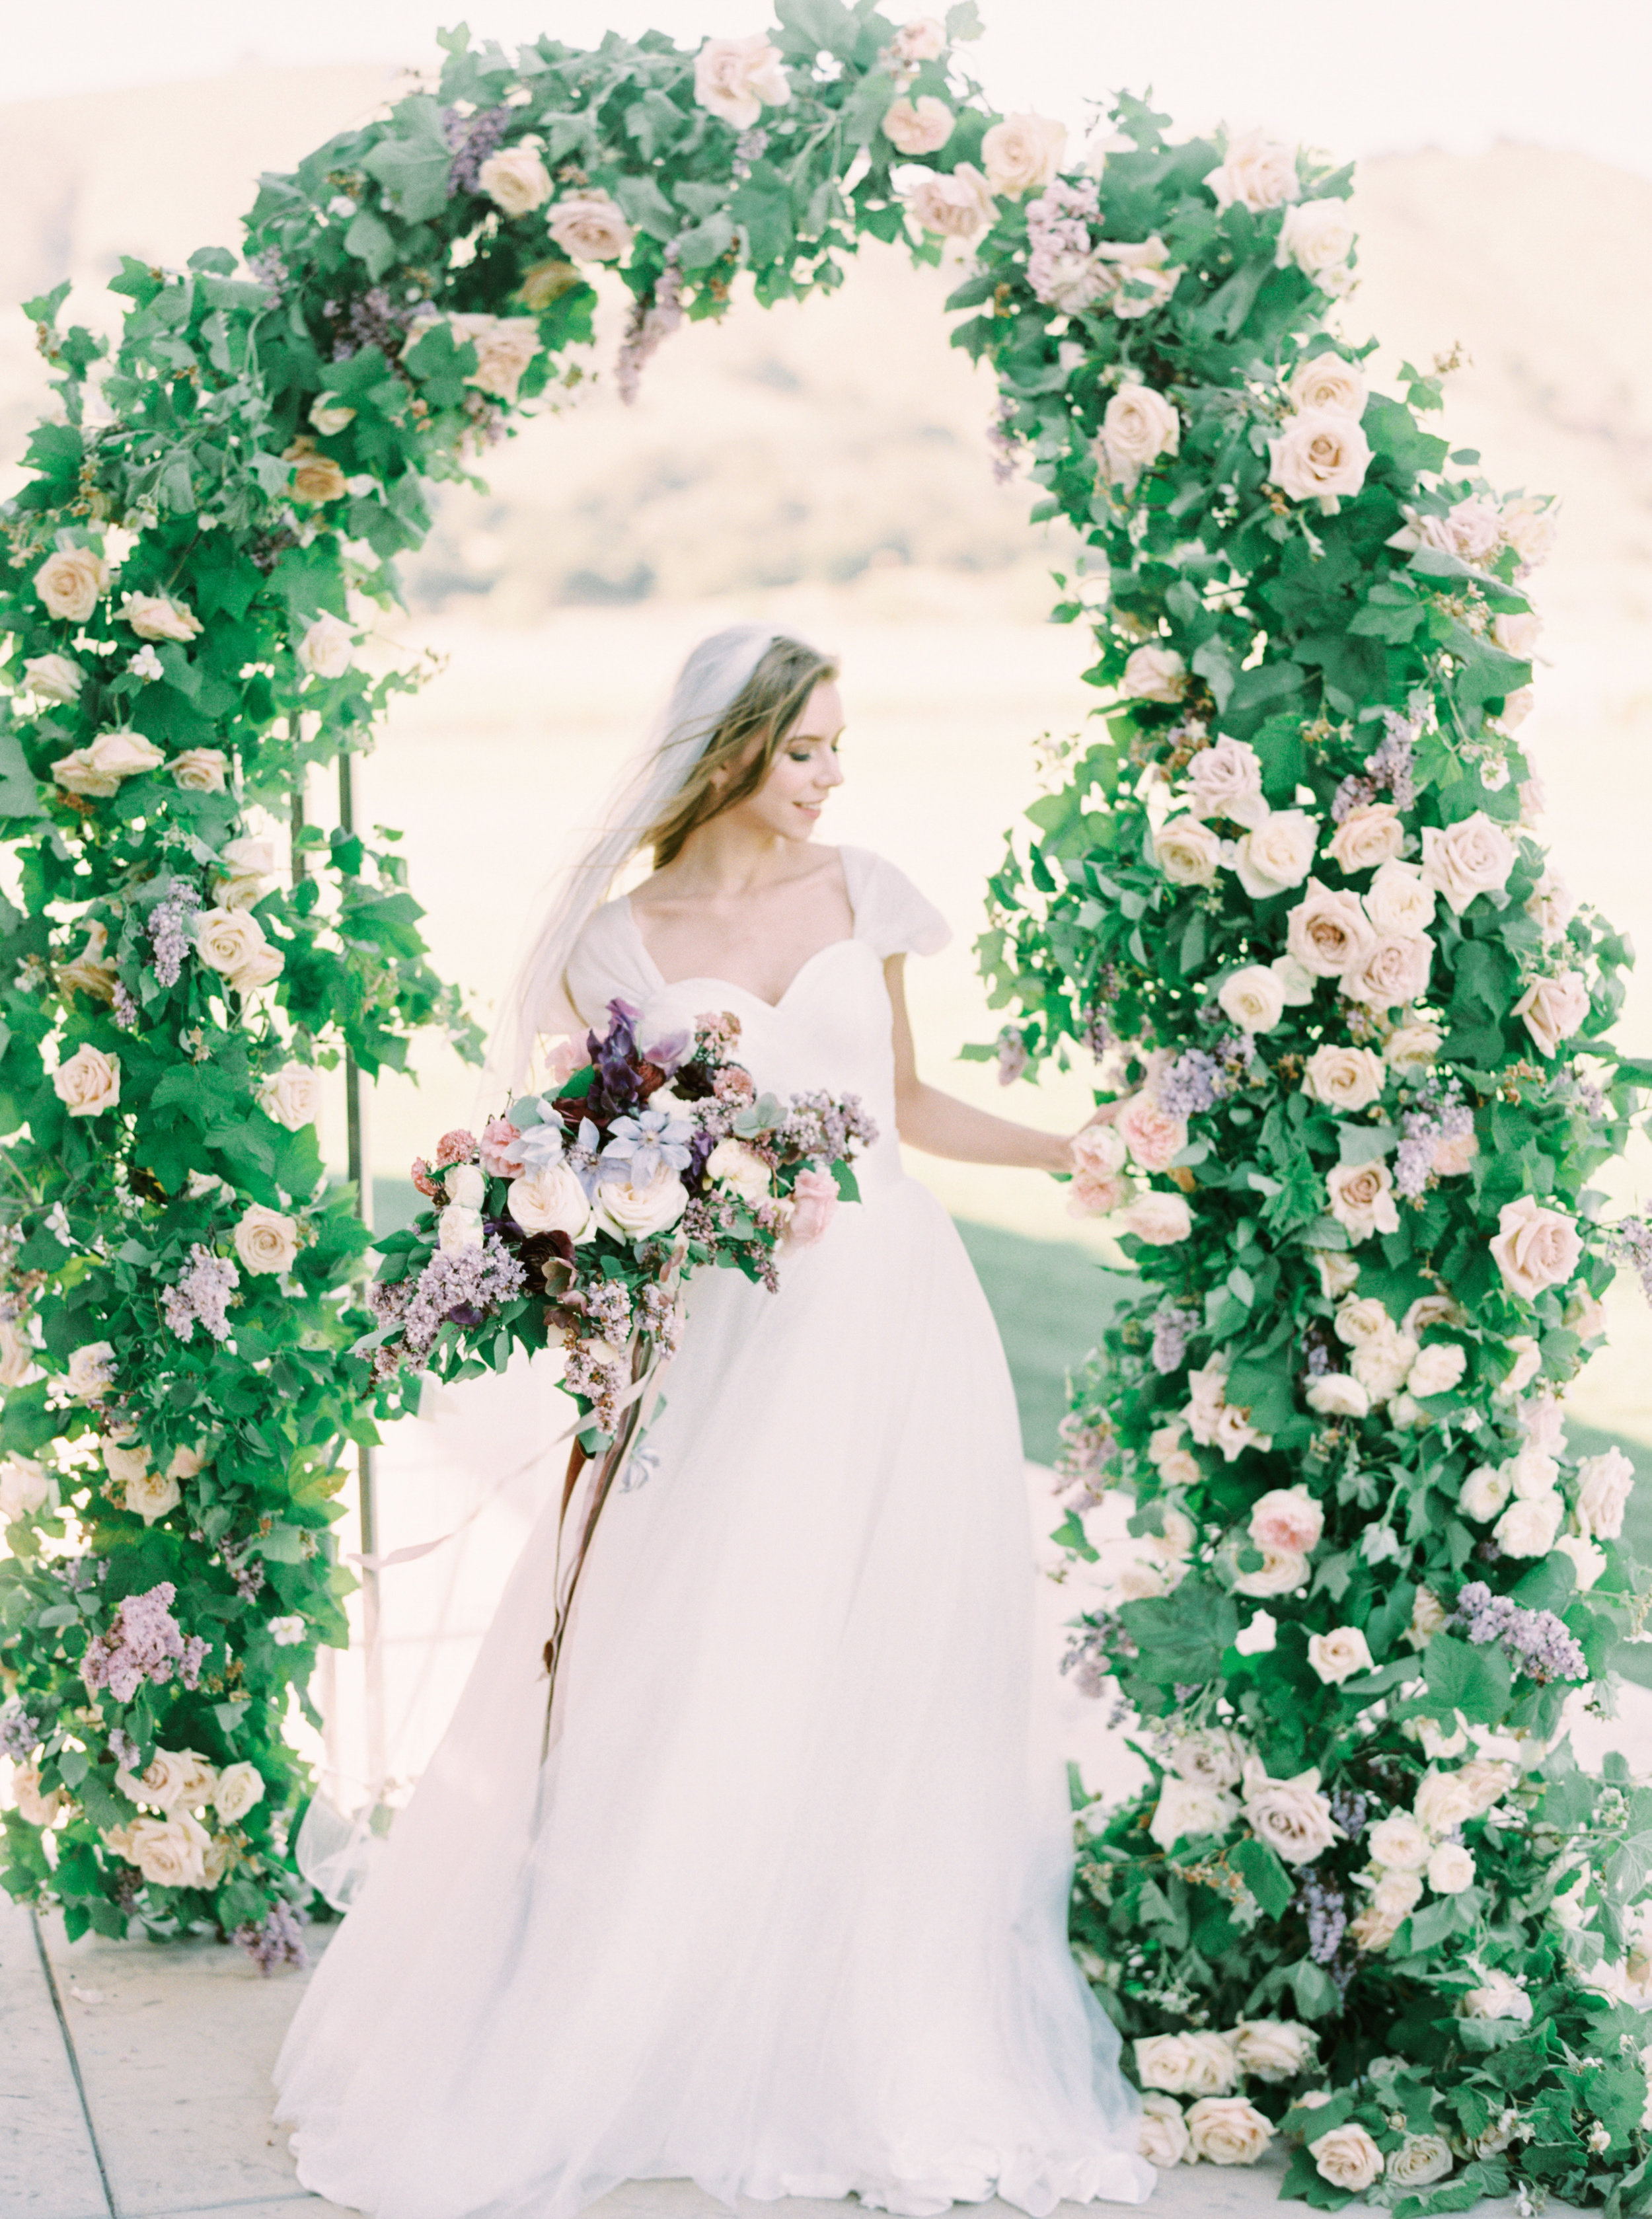 This-Love-of-Yours-Kirigin-Cellars-Flower-Arch-Styled-Shoot-100.jpg